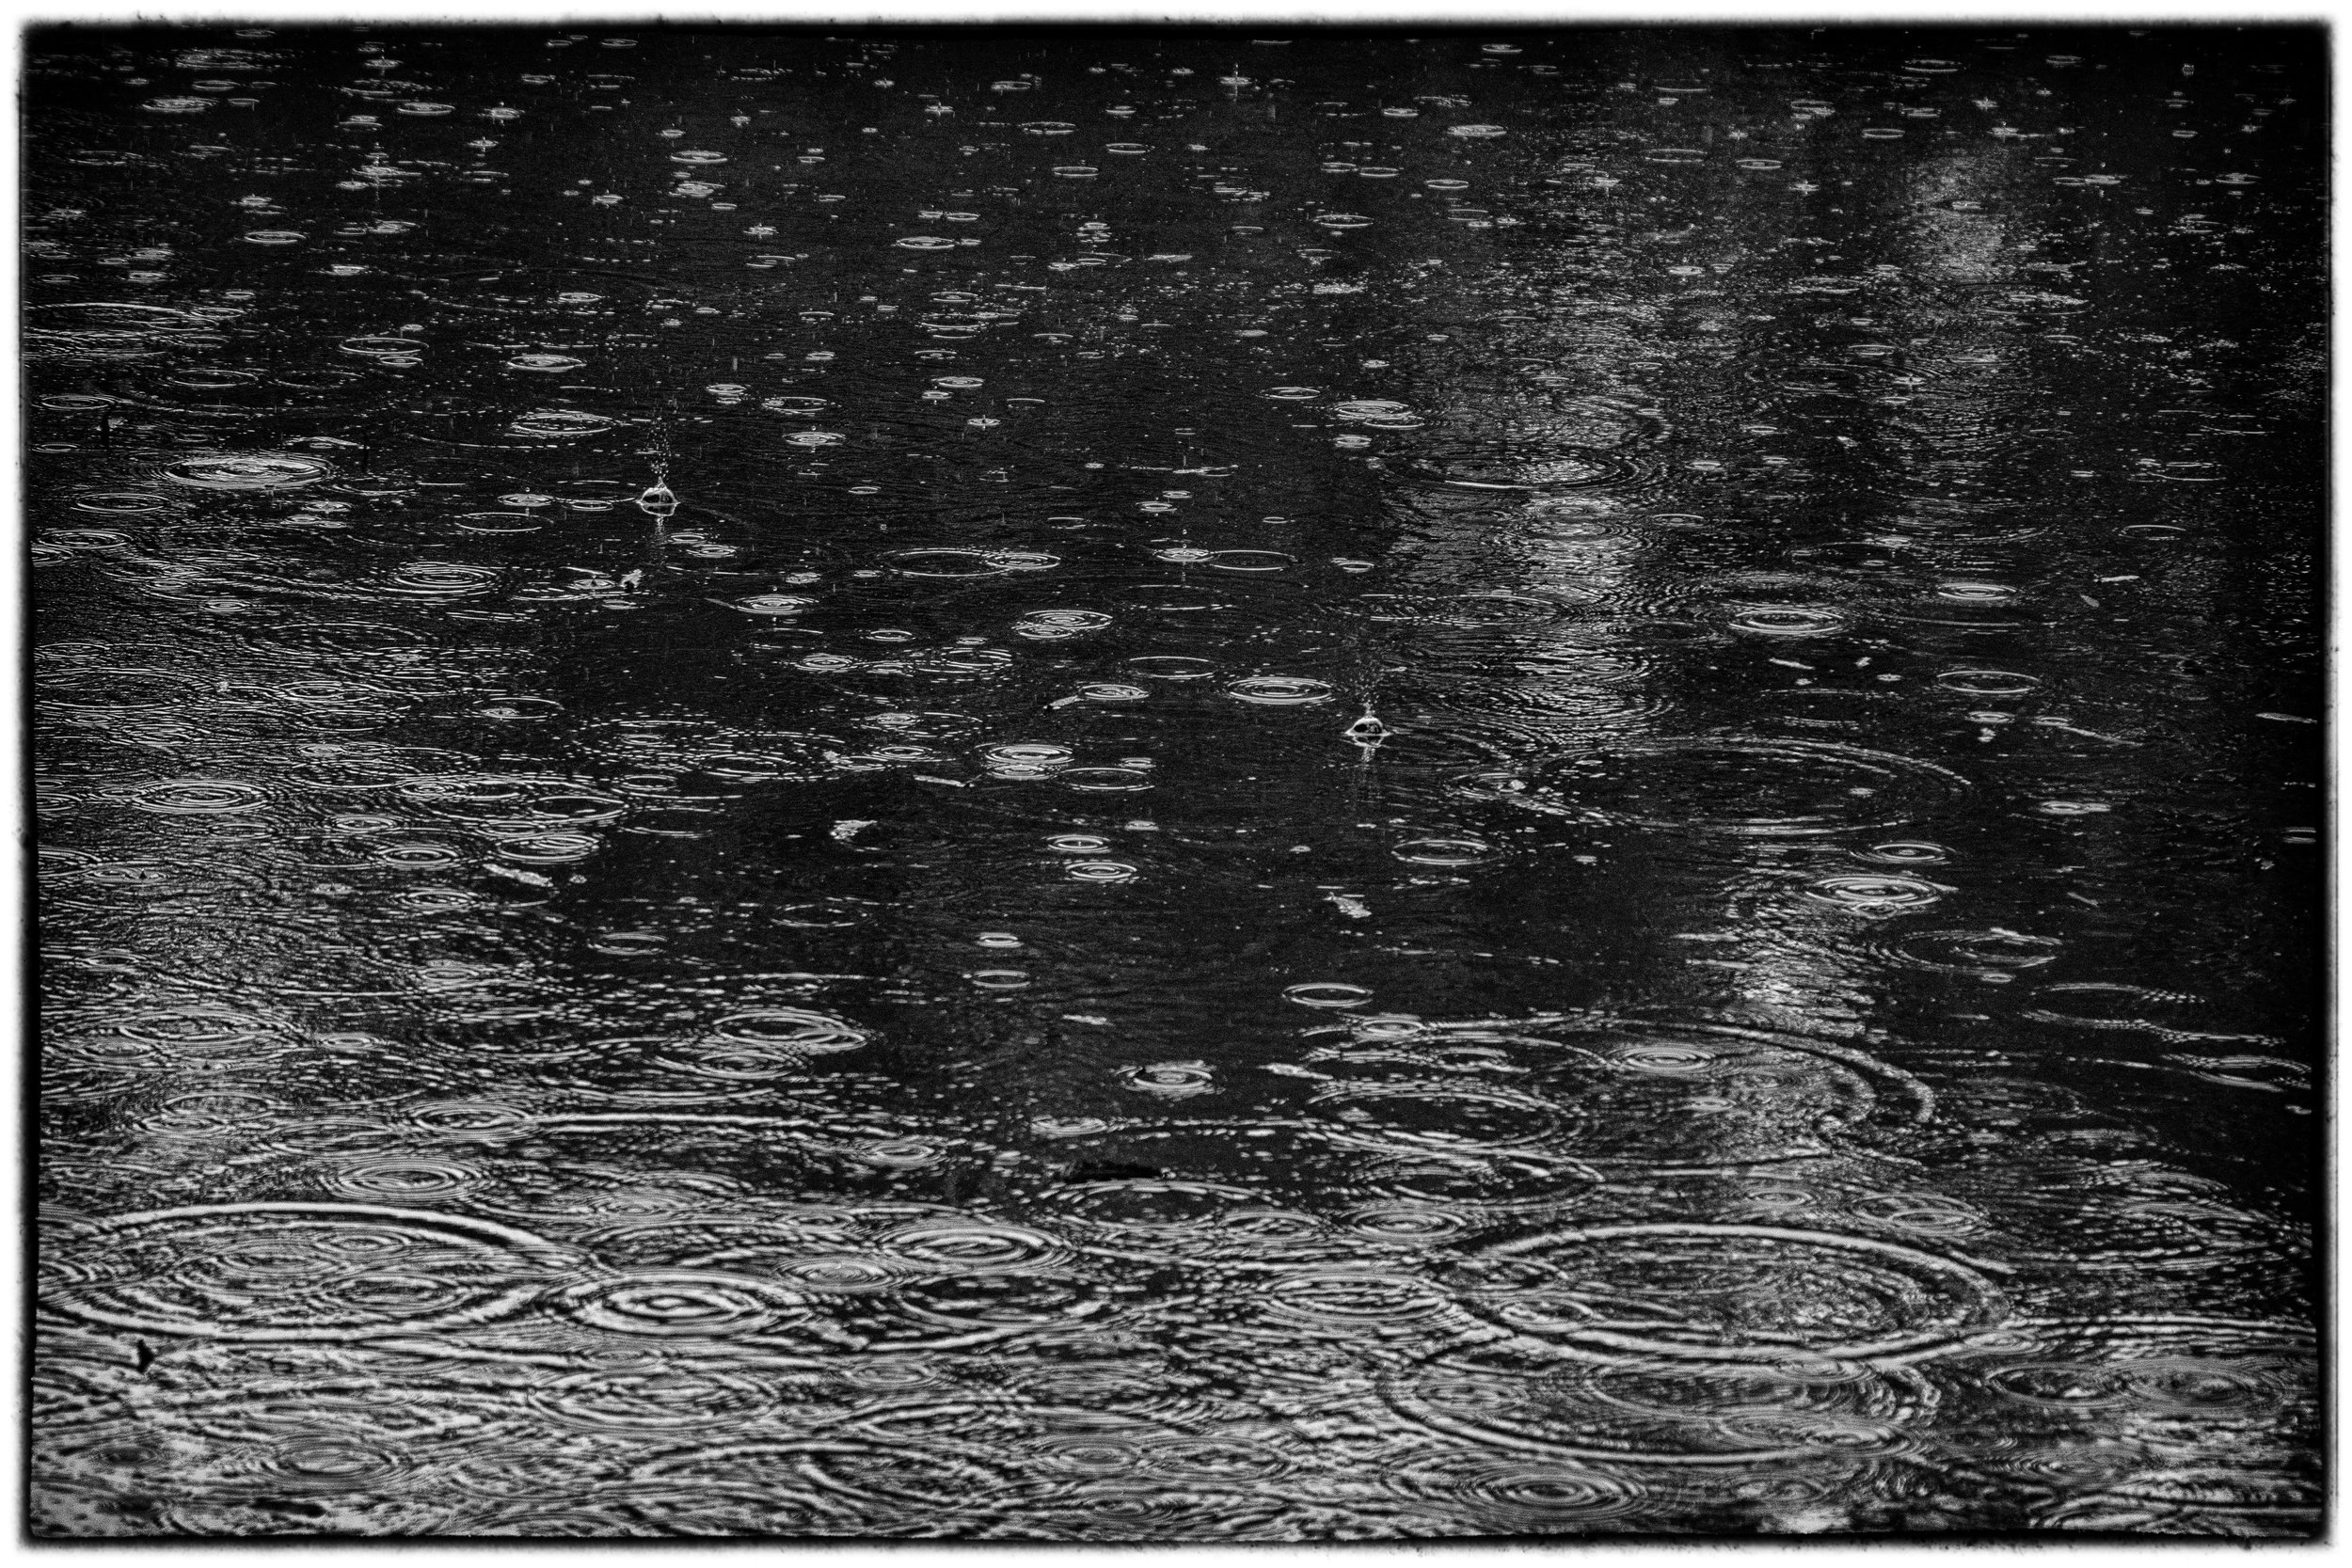 Infrared raindrop